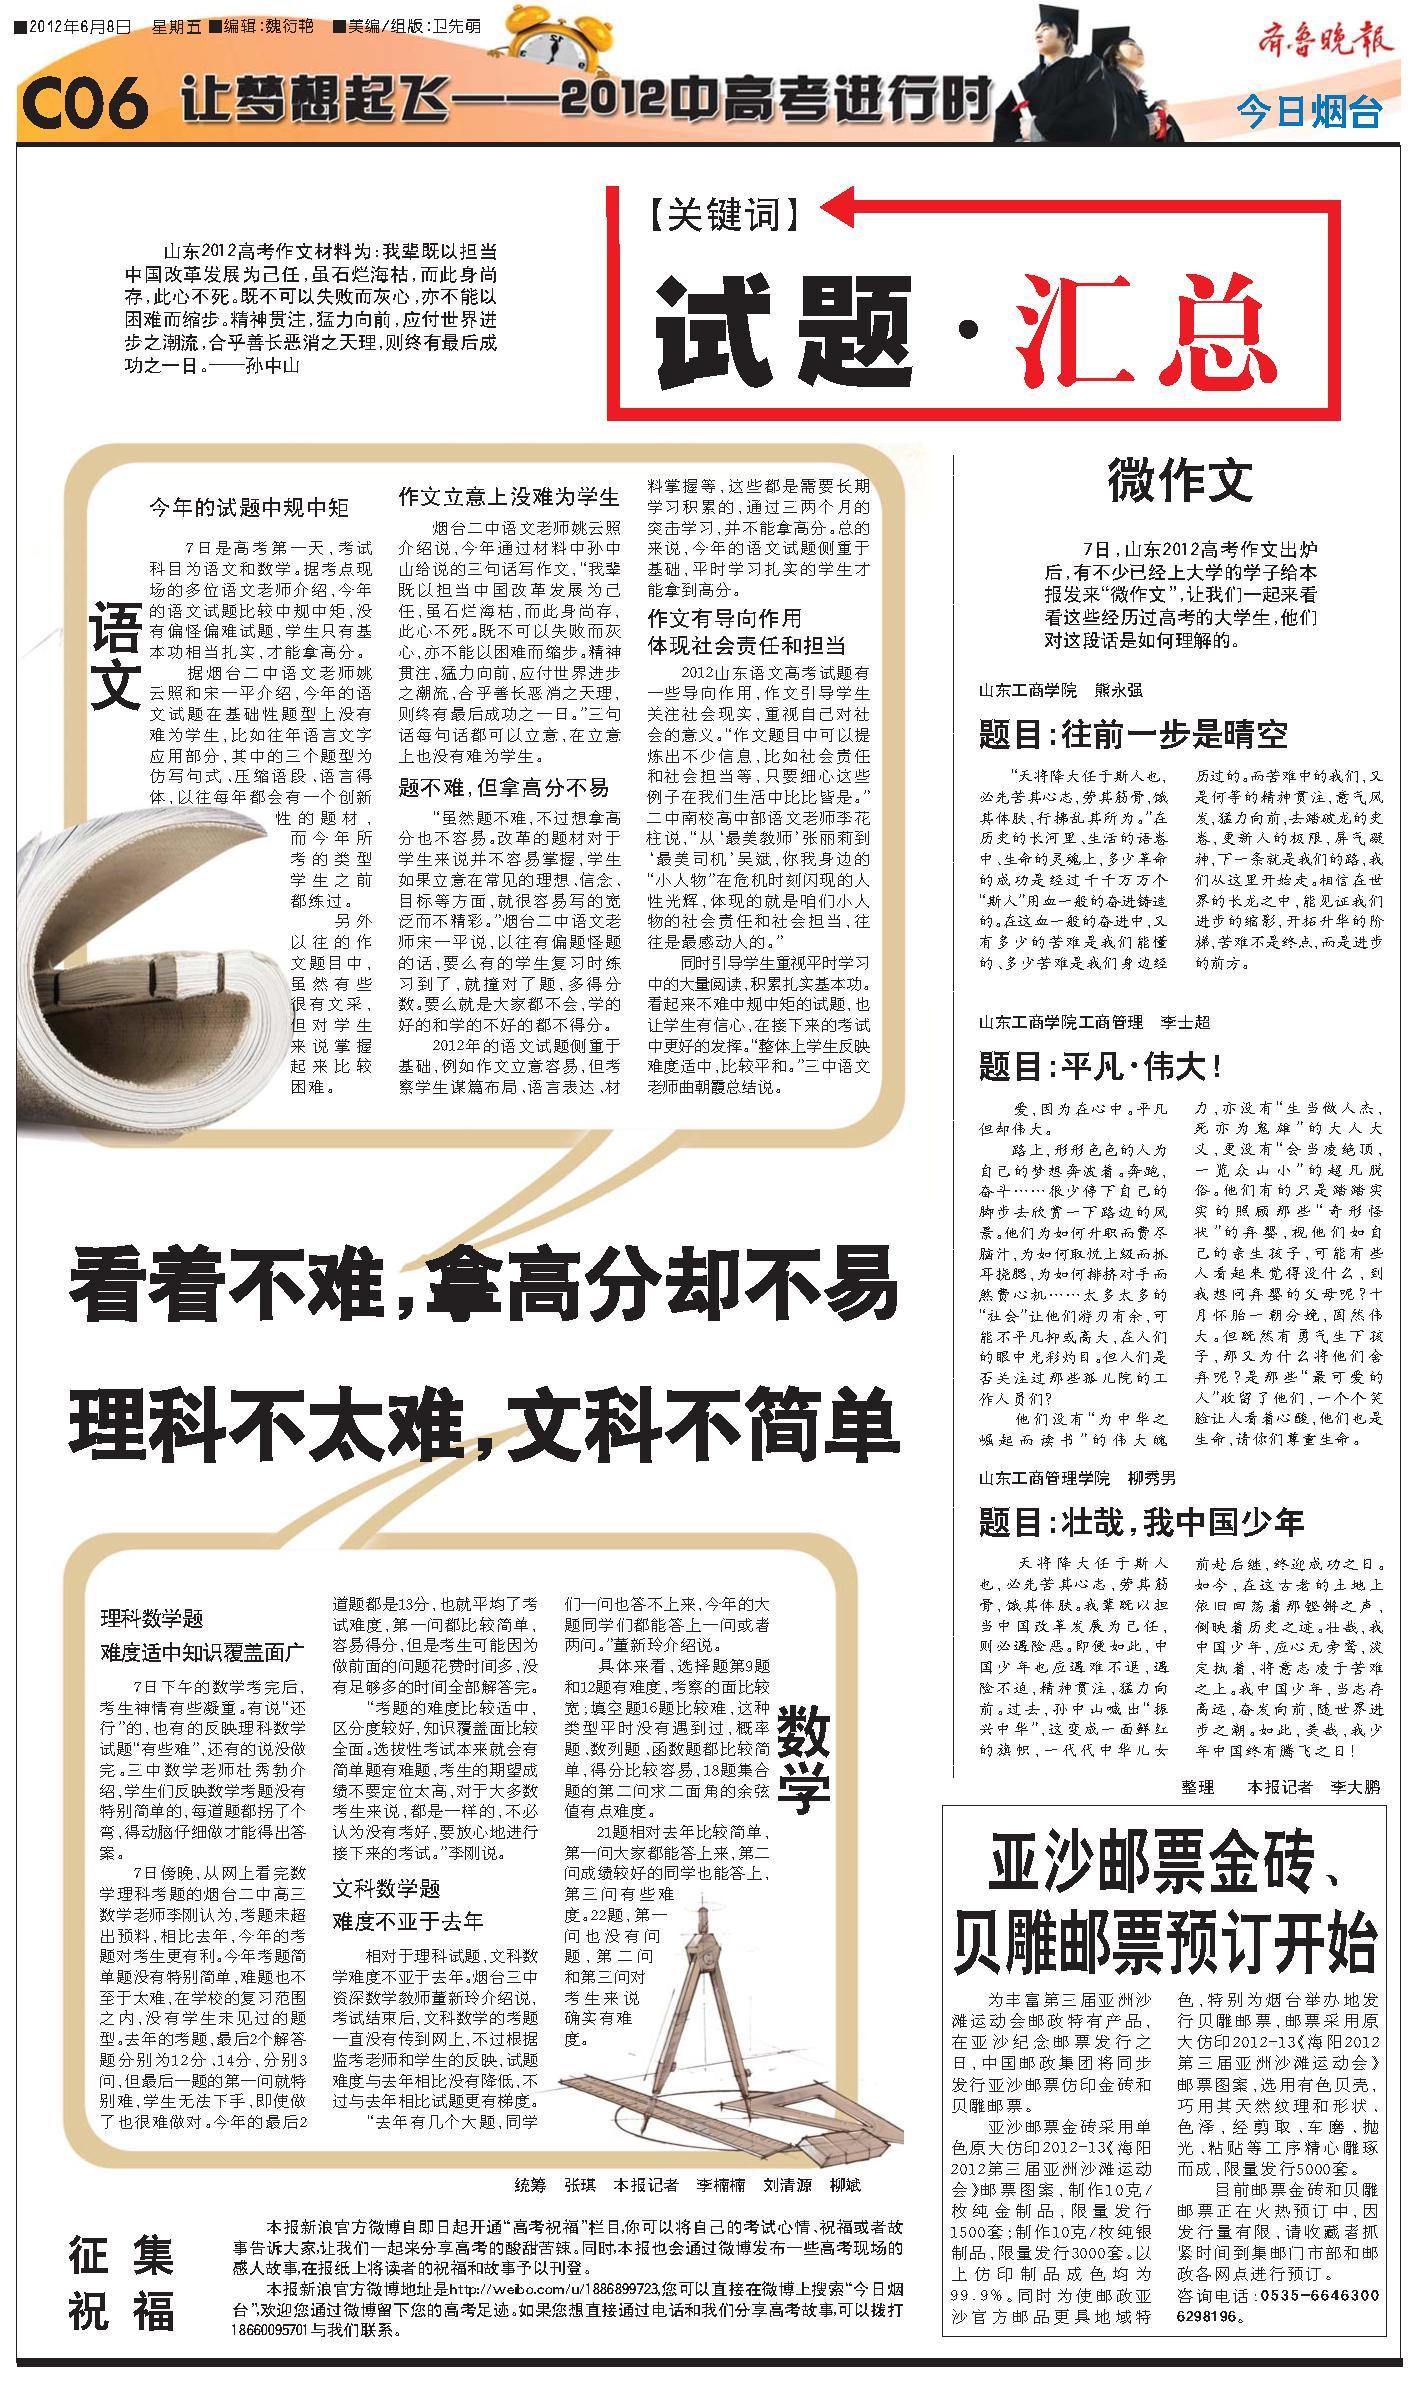 epaper.qlwb.com.cn - /qlwb/IMAGE/20120608/J06/